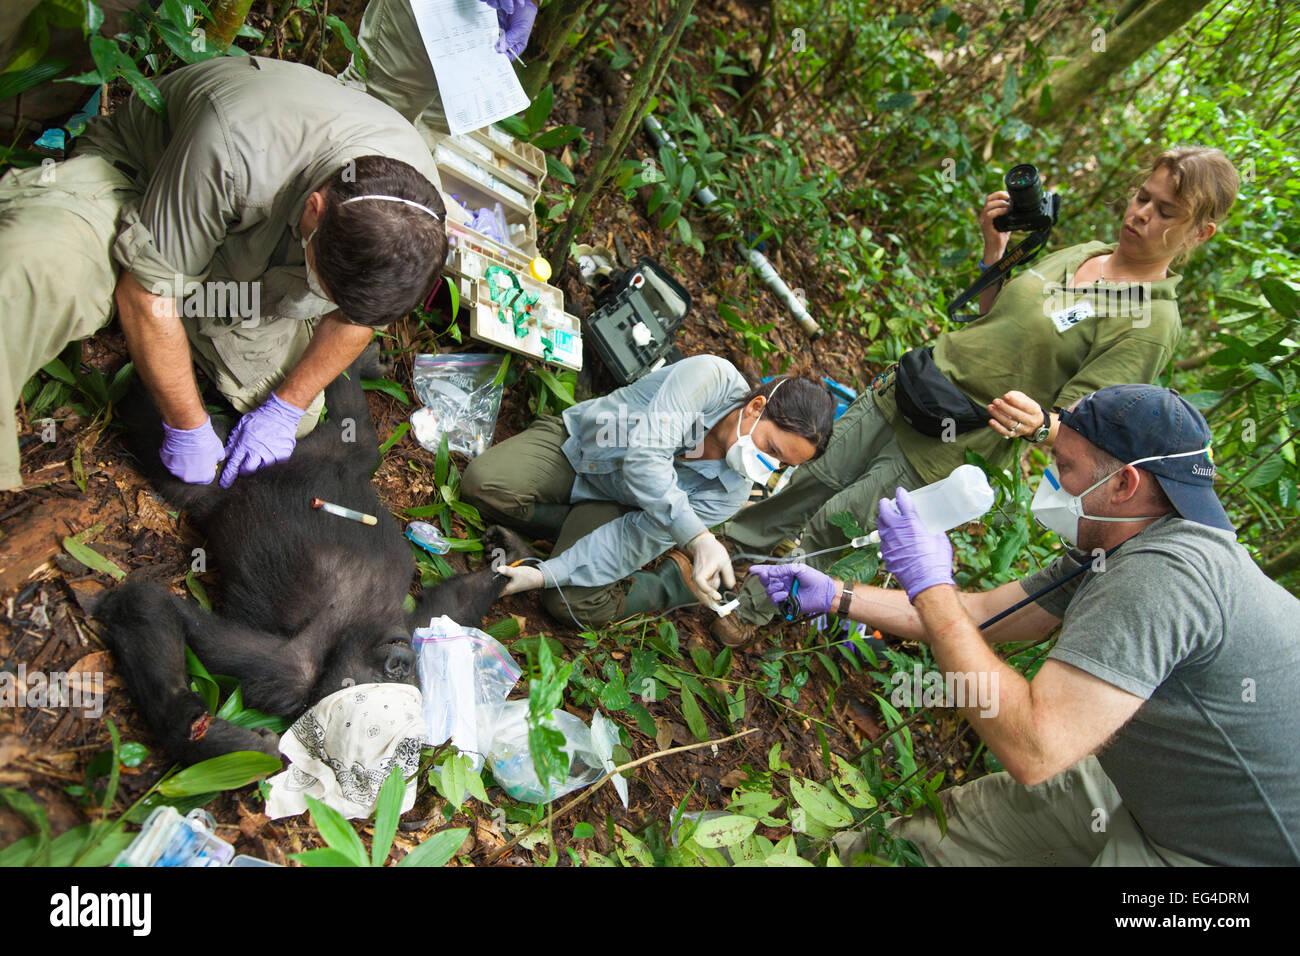 Angelique Todd veterinarians during the anaesthesia 'Blackback' Western Gorilla (Gorilla gorilla) 'Ngobo'. - Stock Image